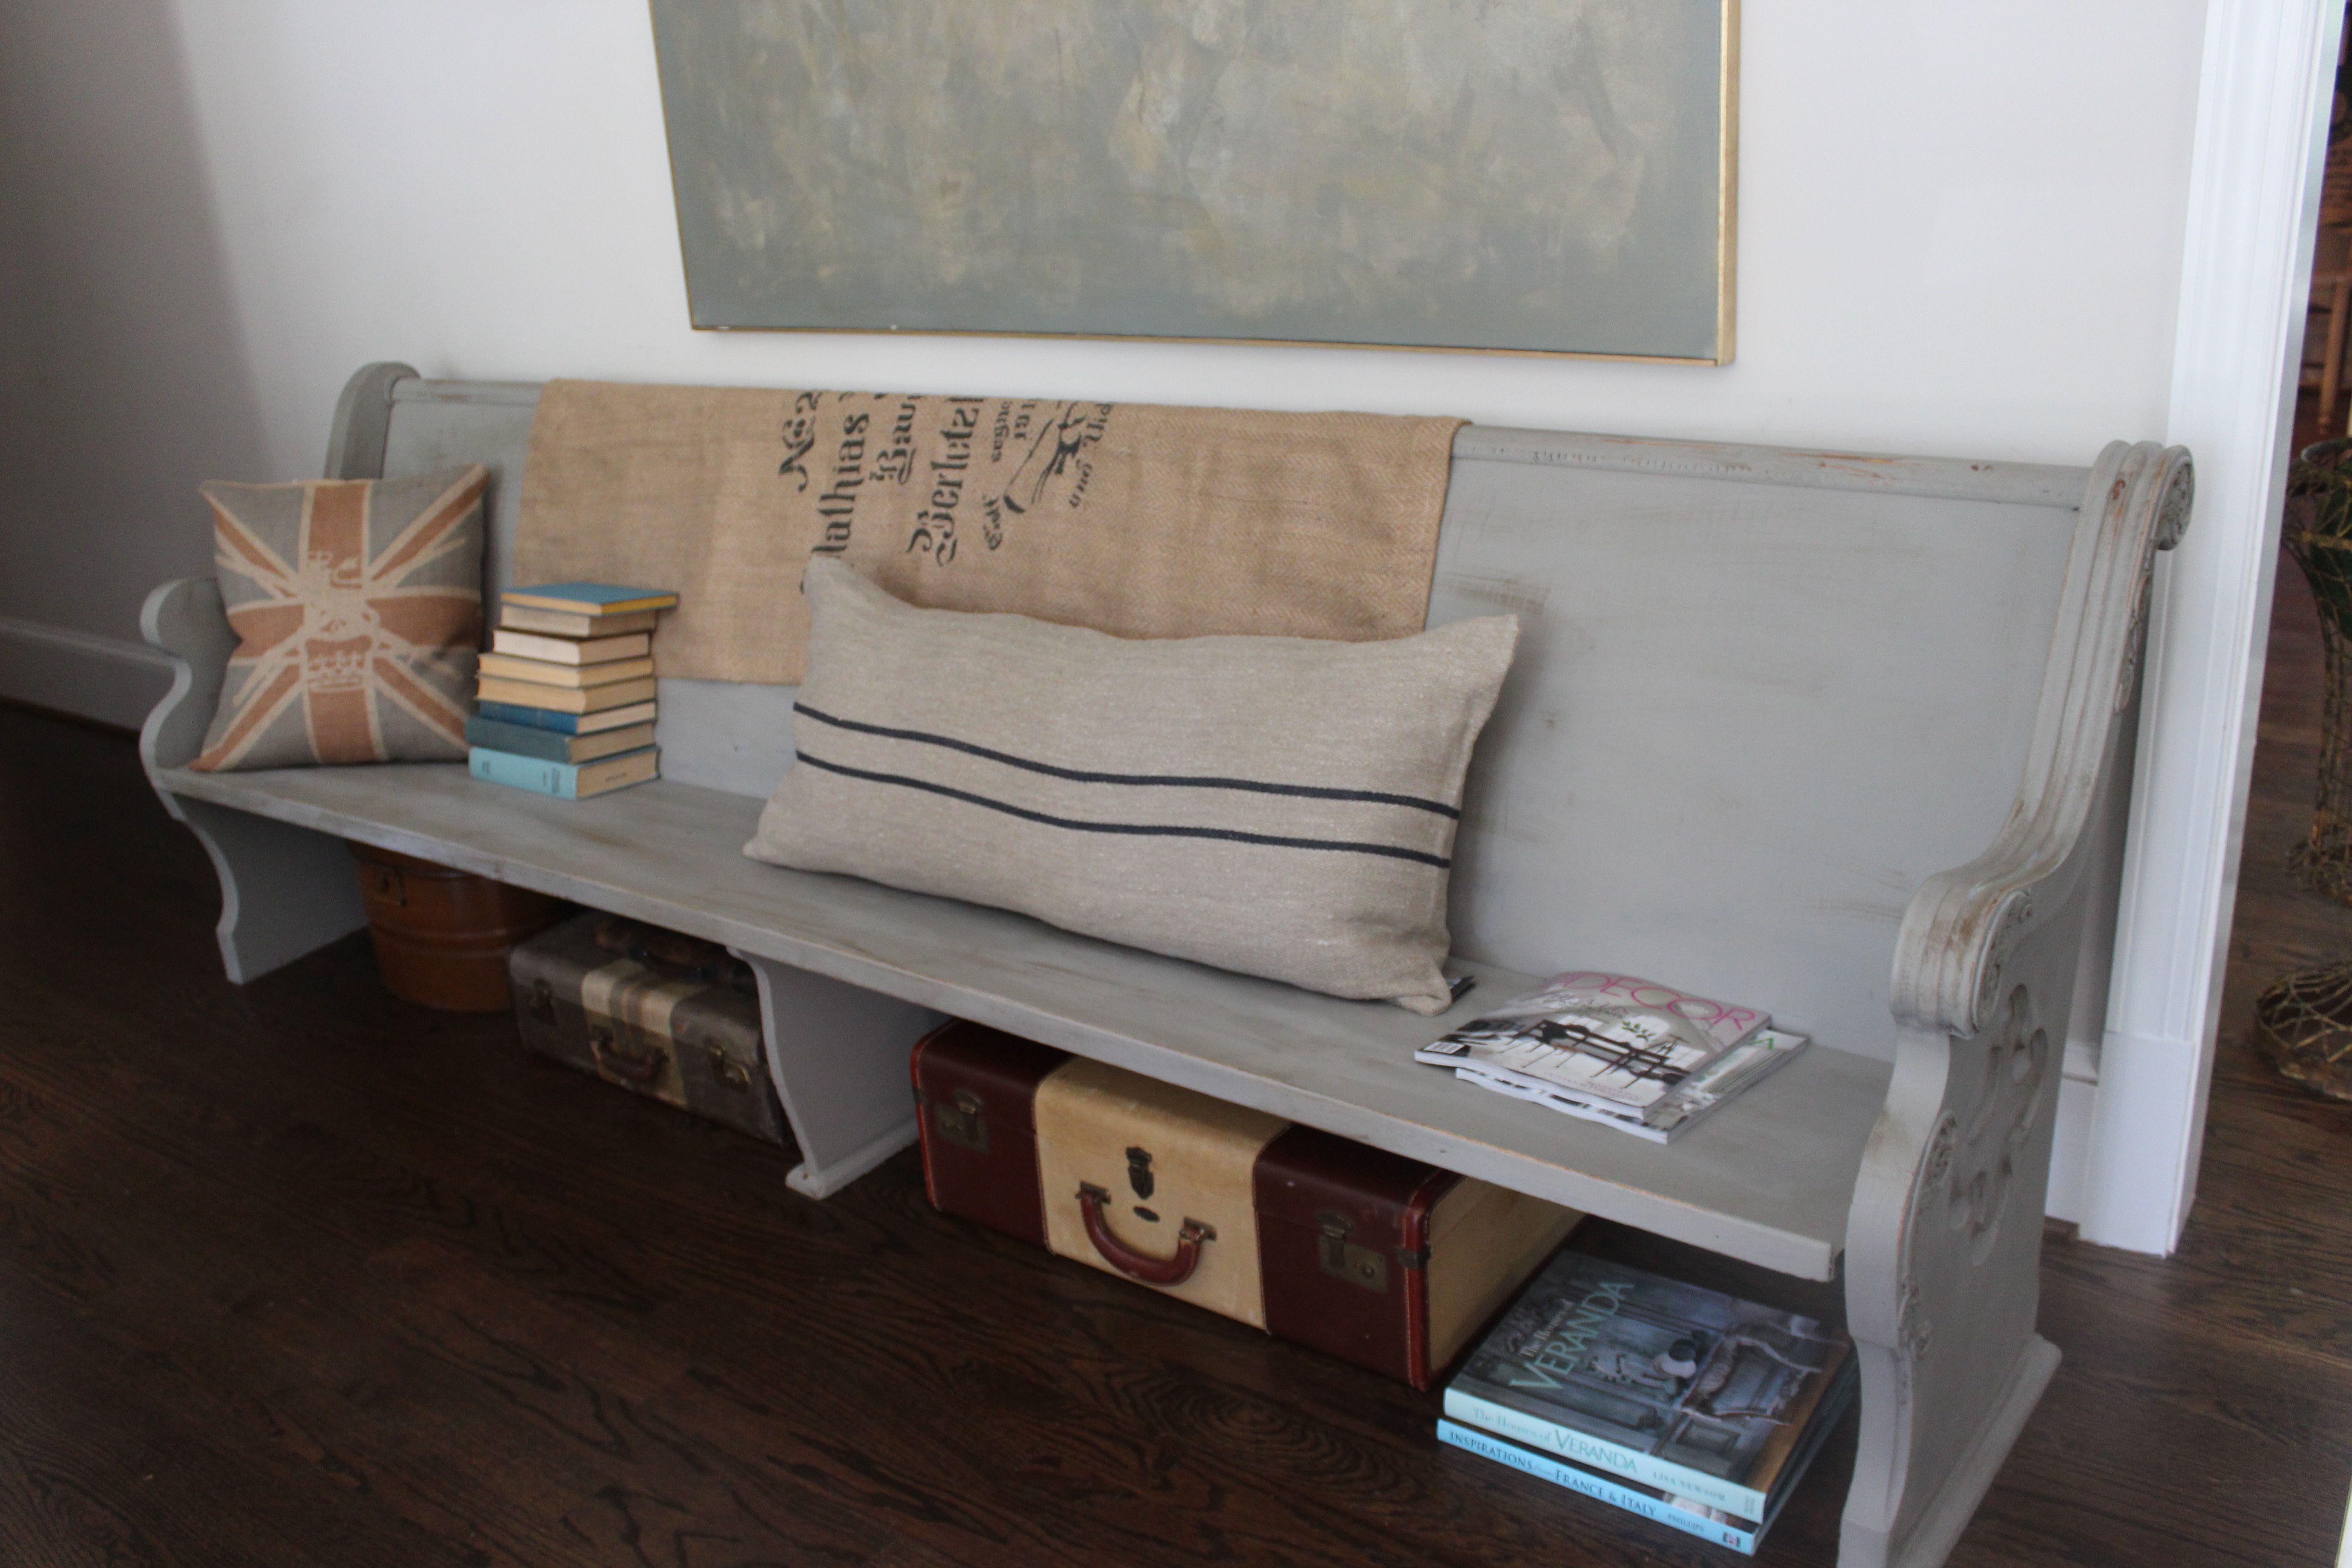 Refinished Furniture & Interiors Blue Egg Brown Nest Wwwblueeggbrownnestcom